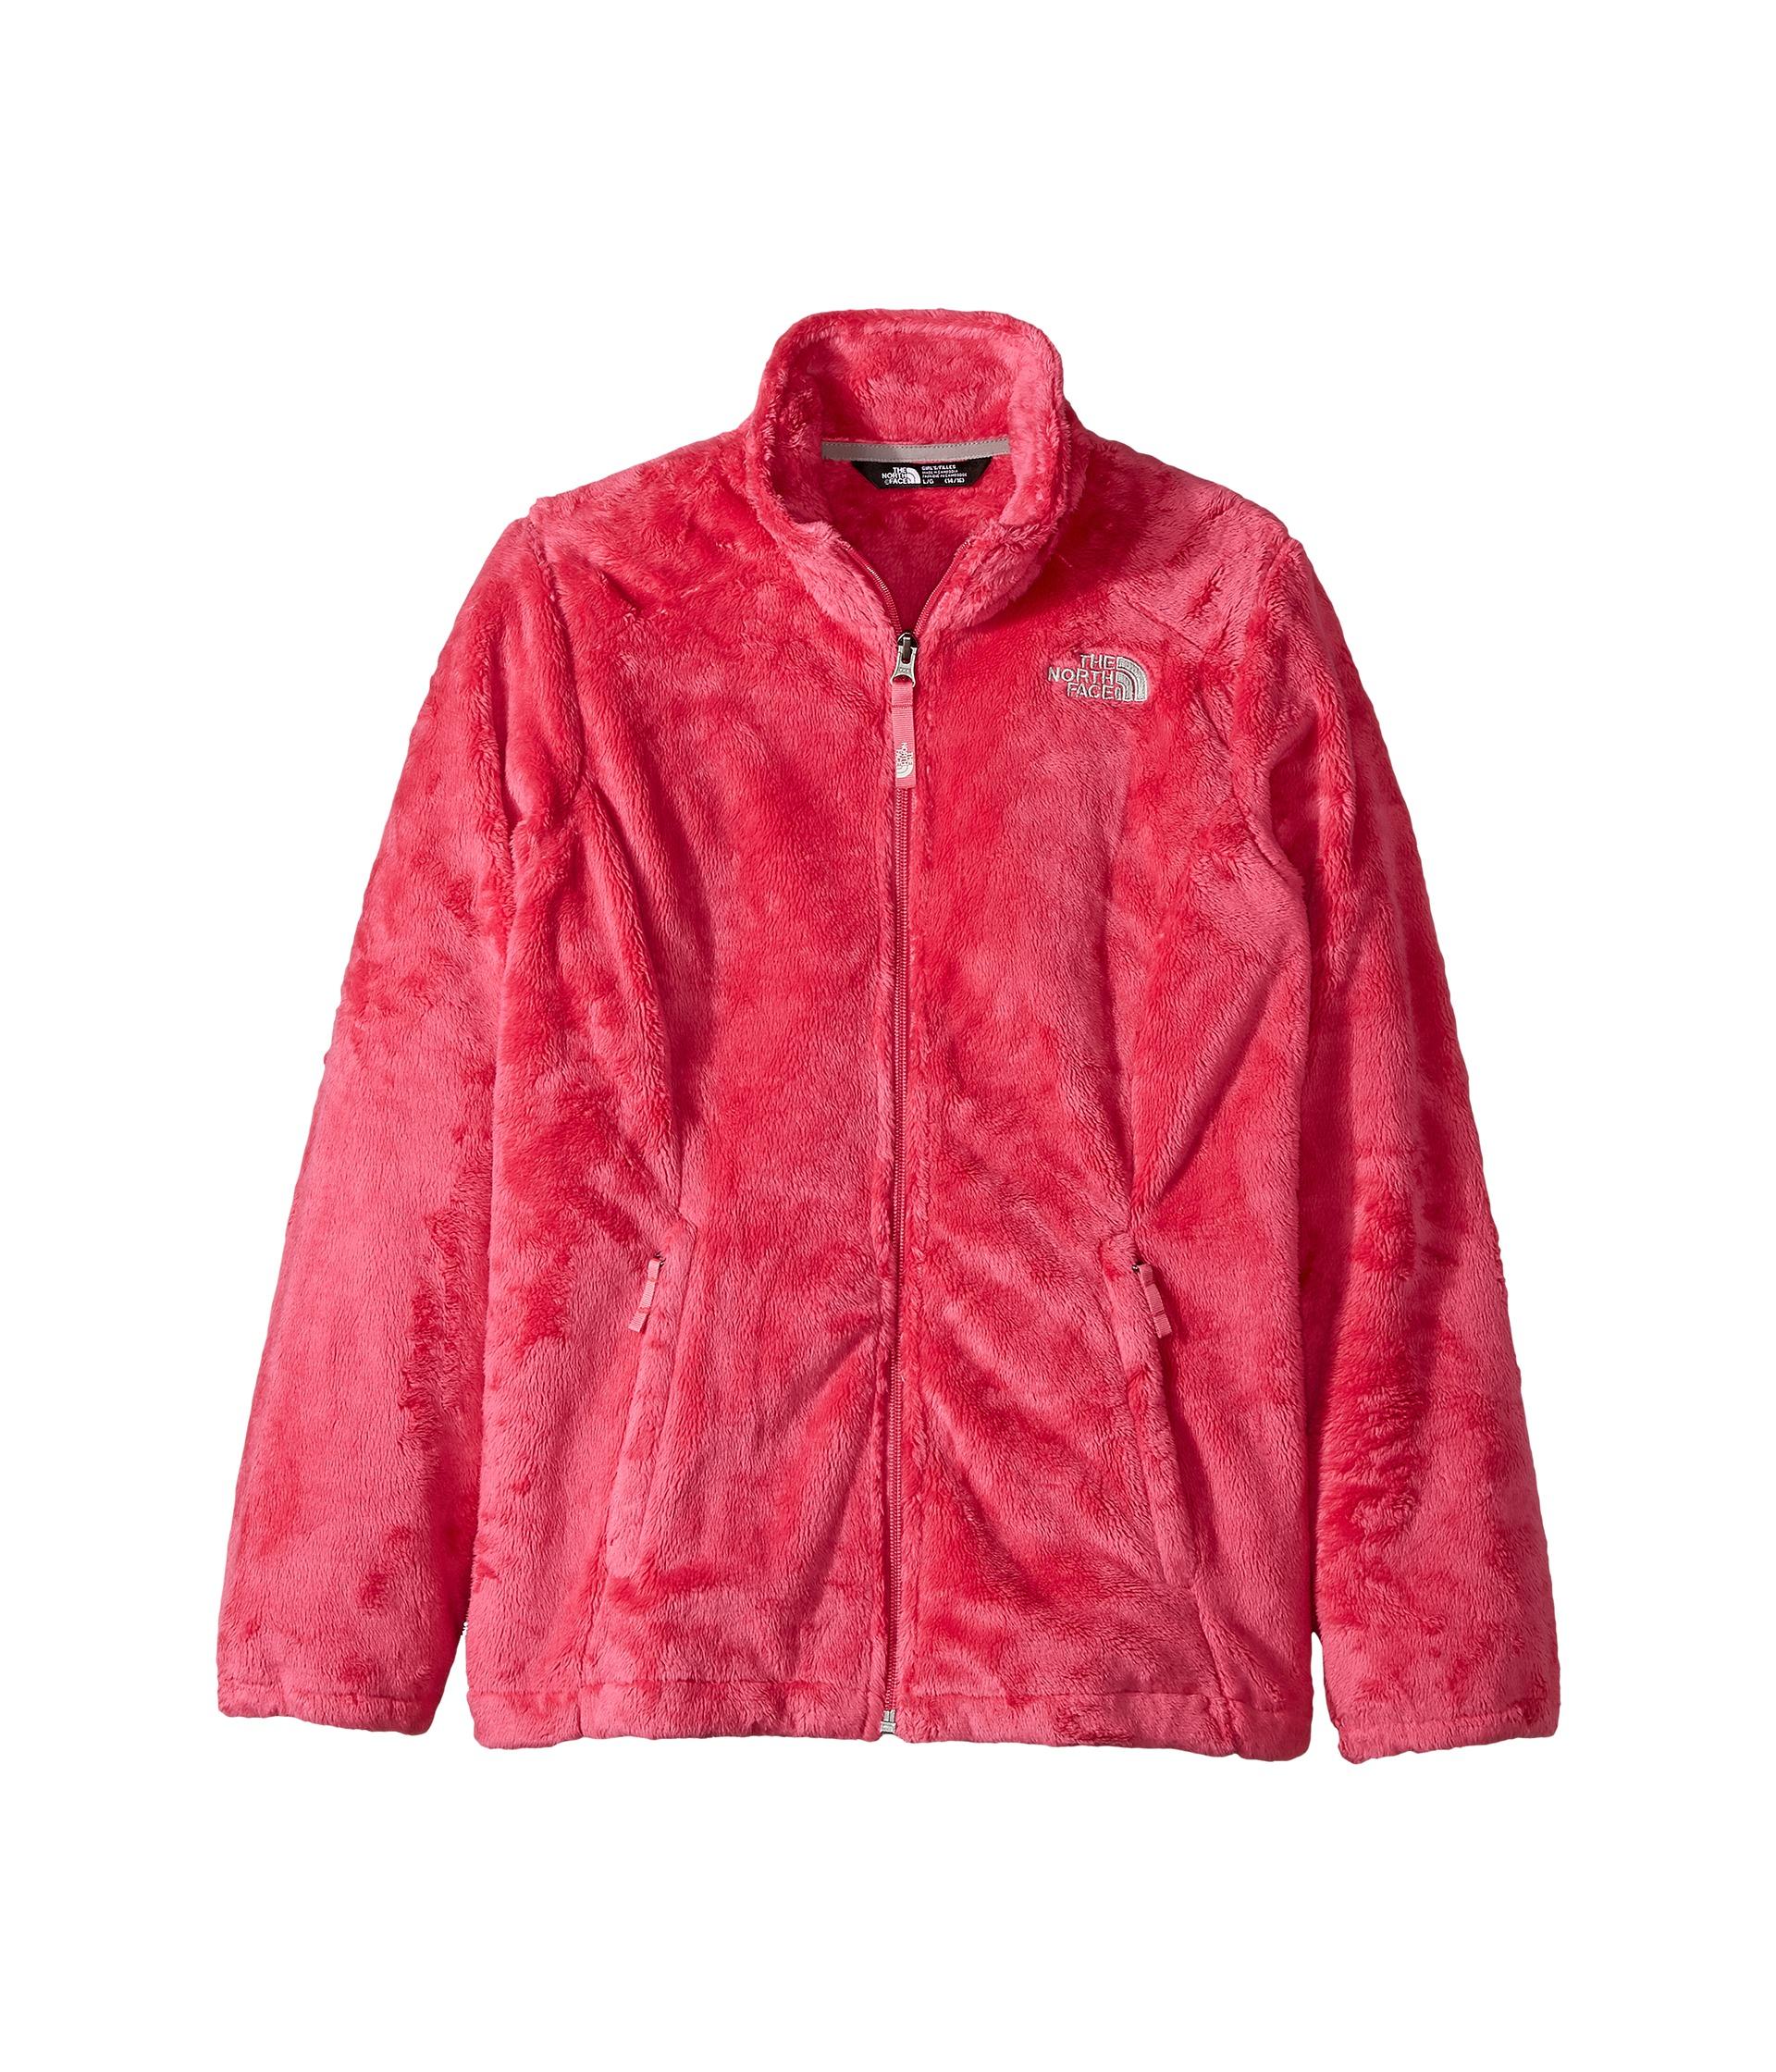 The North Face Girls Osolita Fleece Jacket